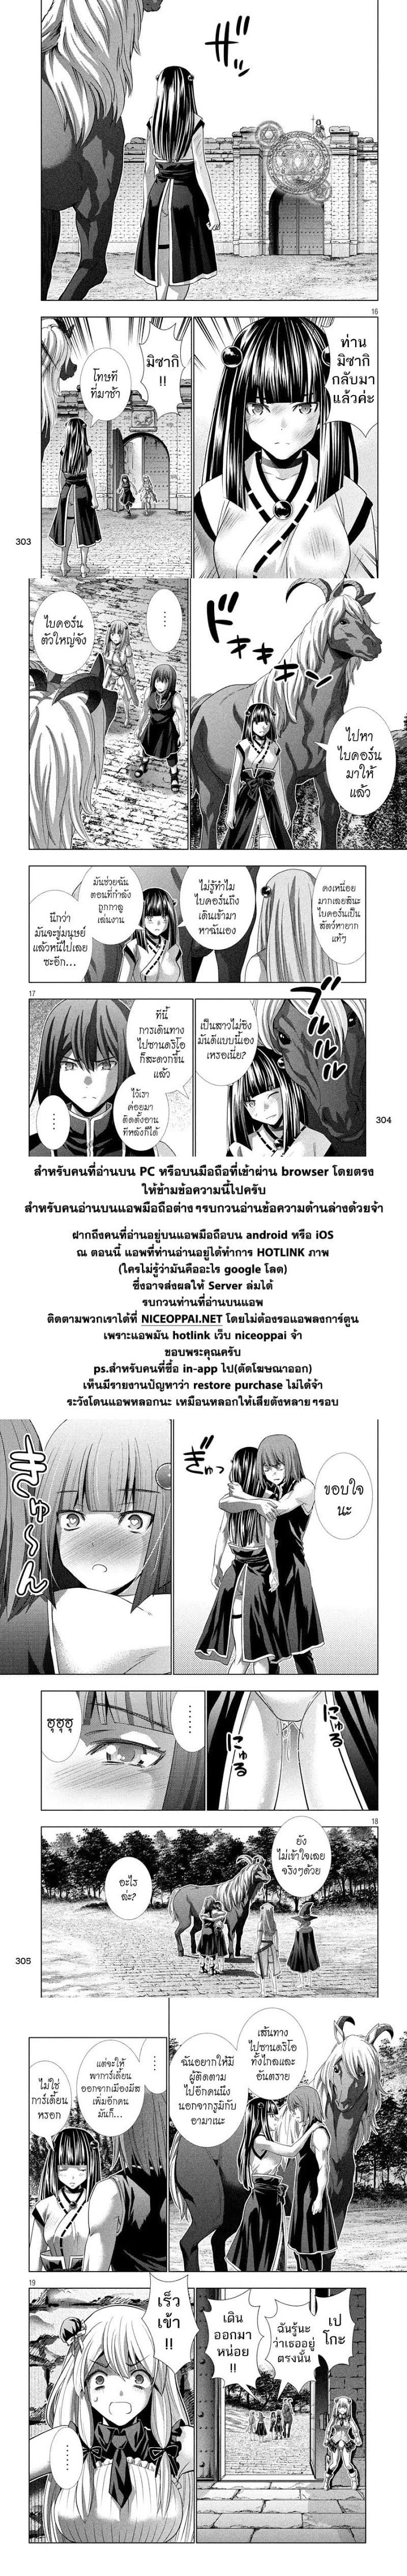 Parallel Paradise - หน้า 16